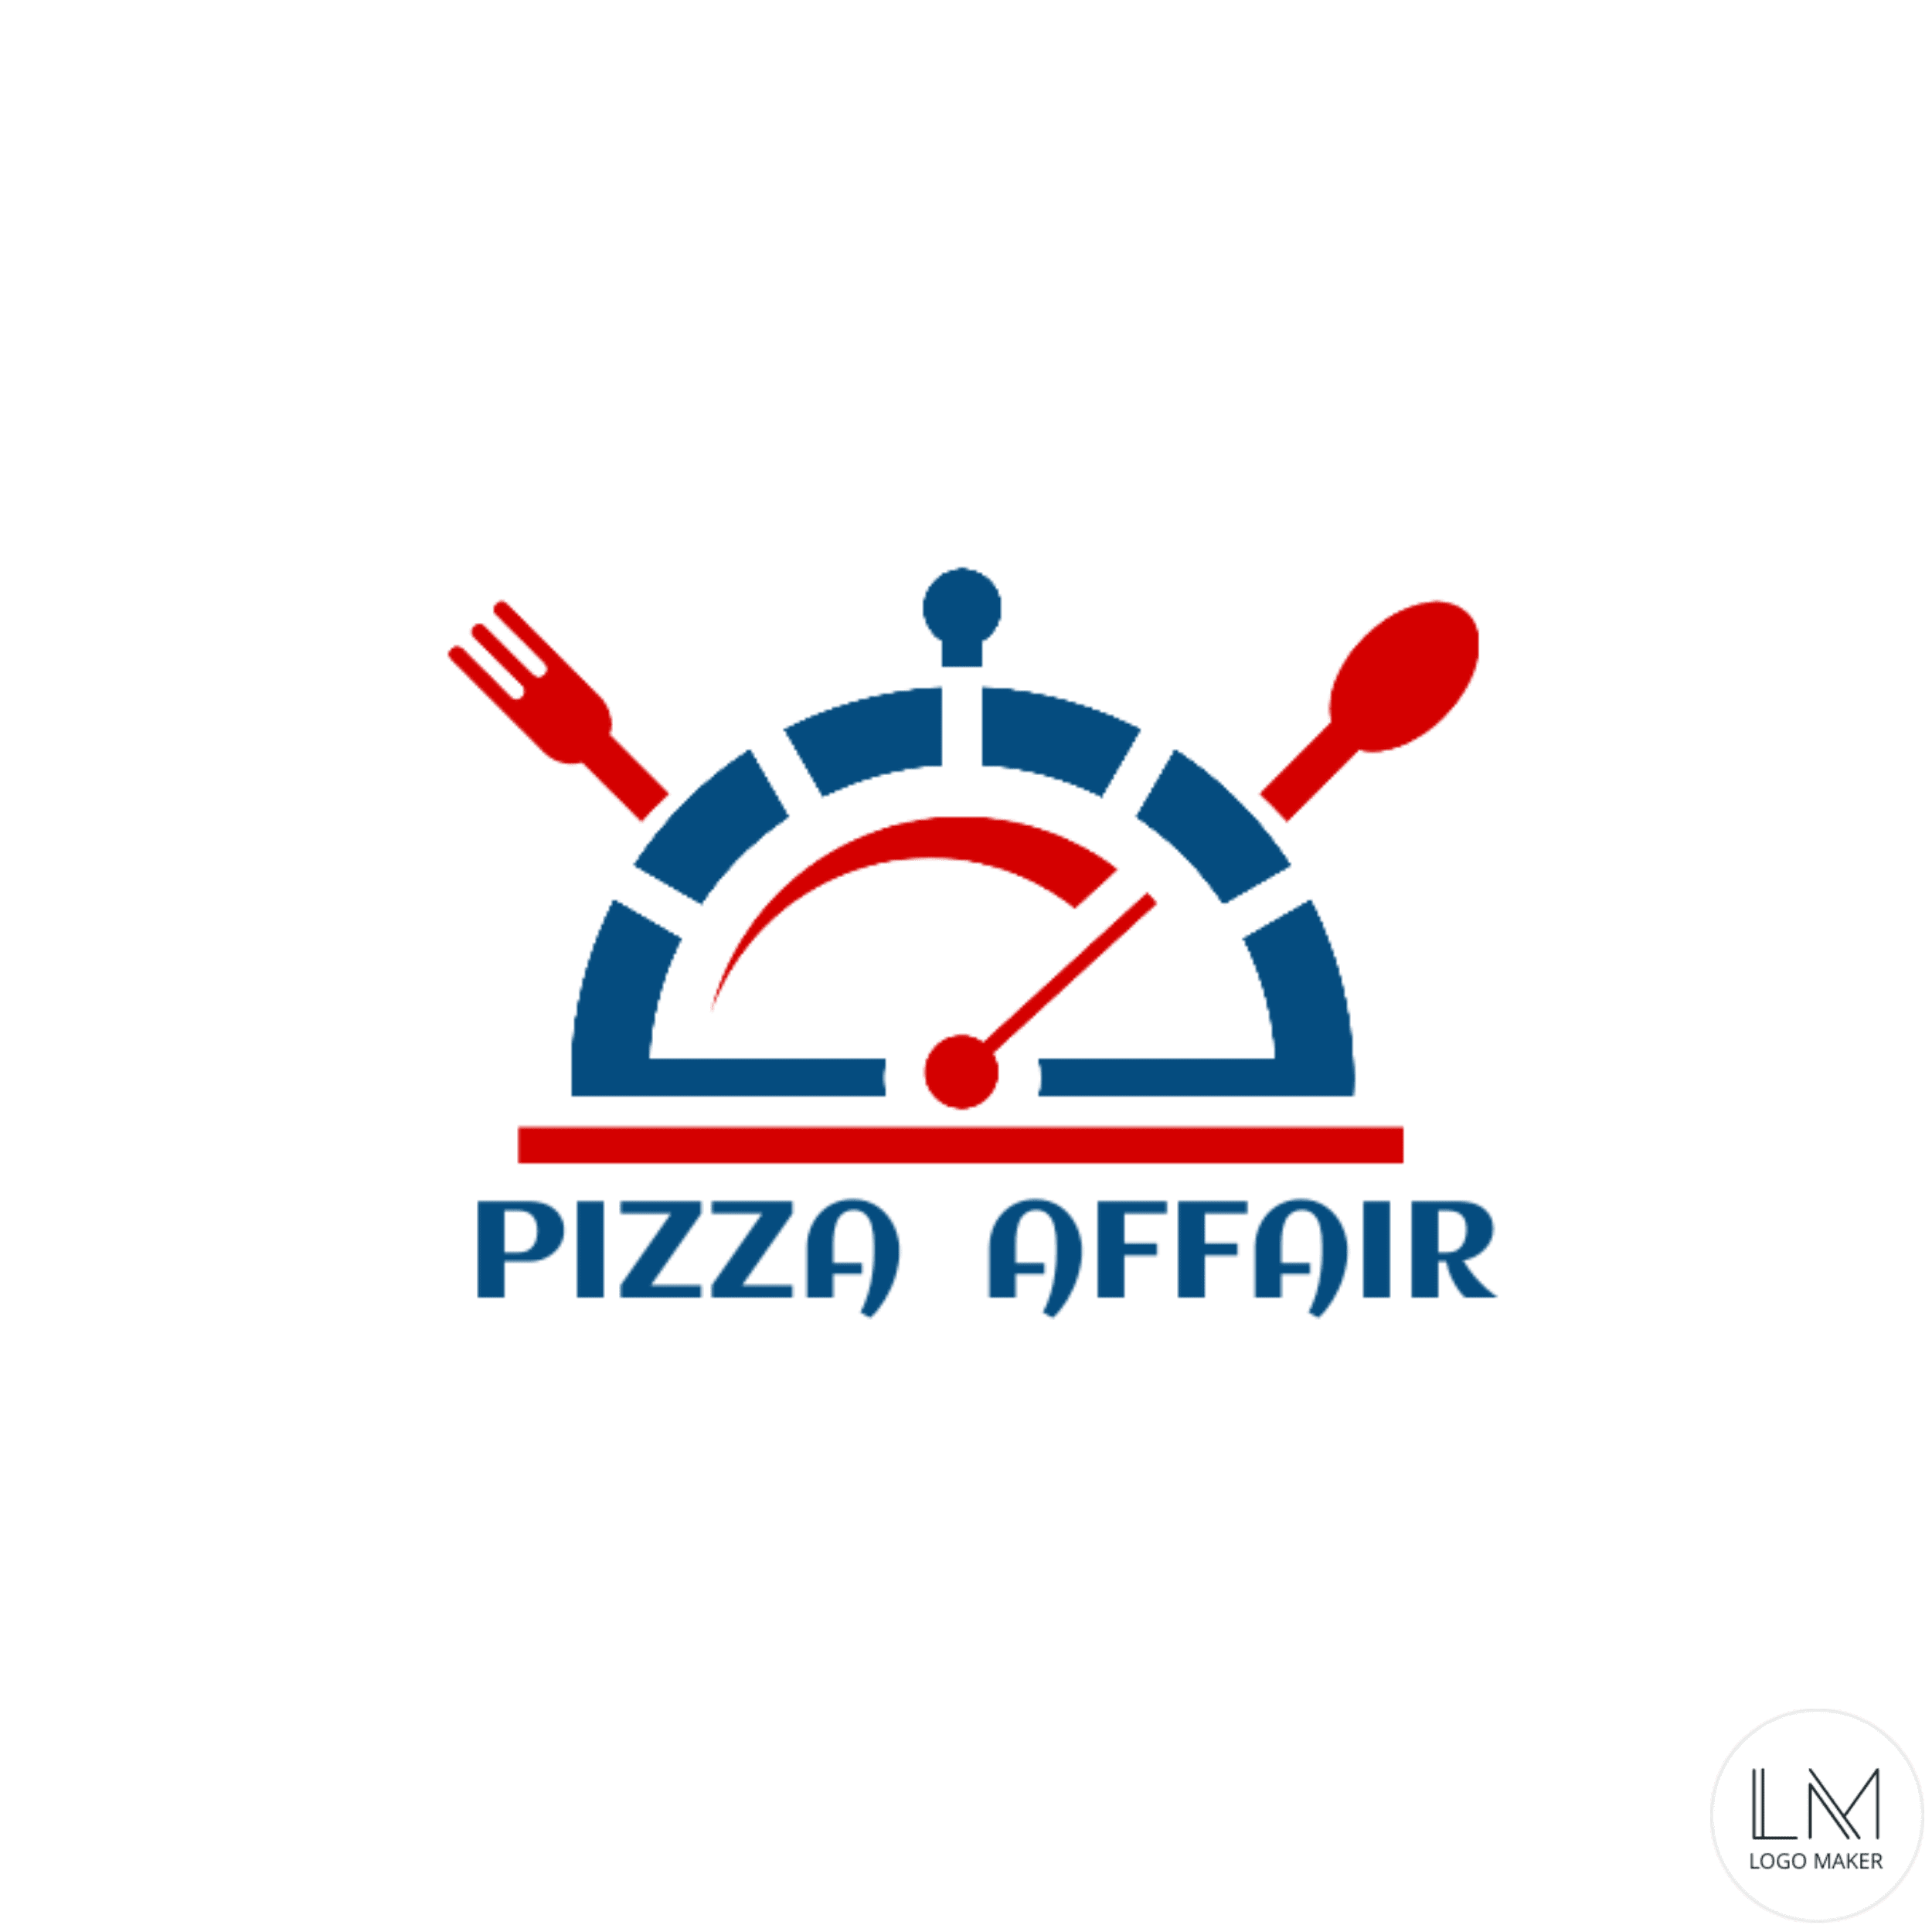 Pizza Affair